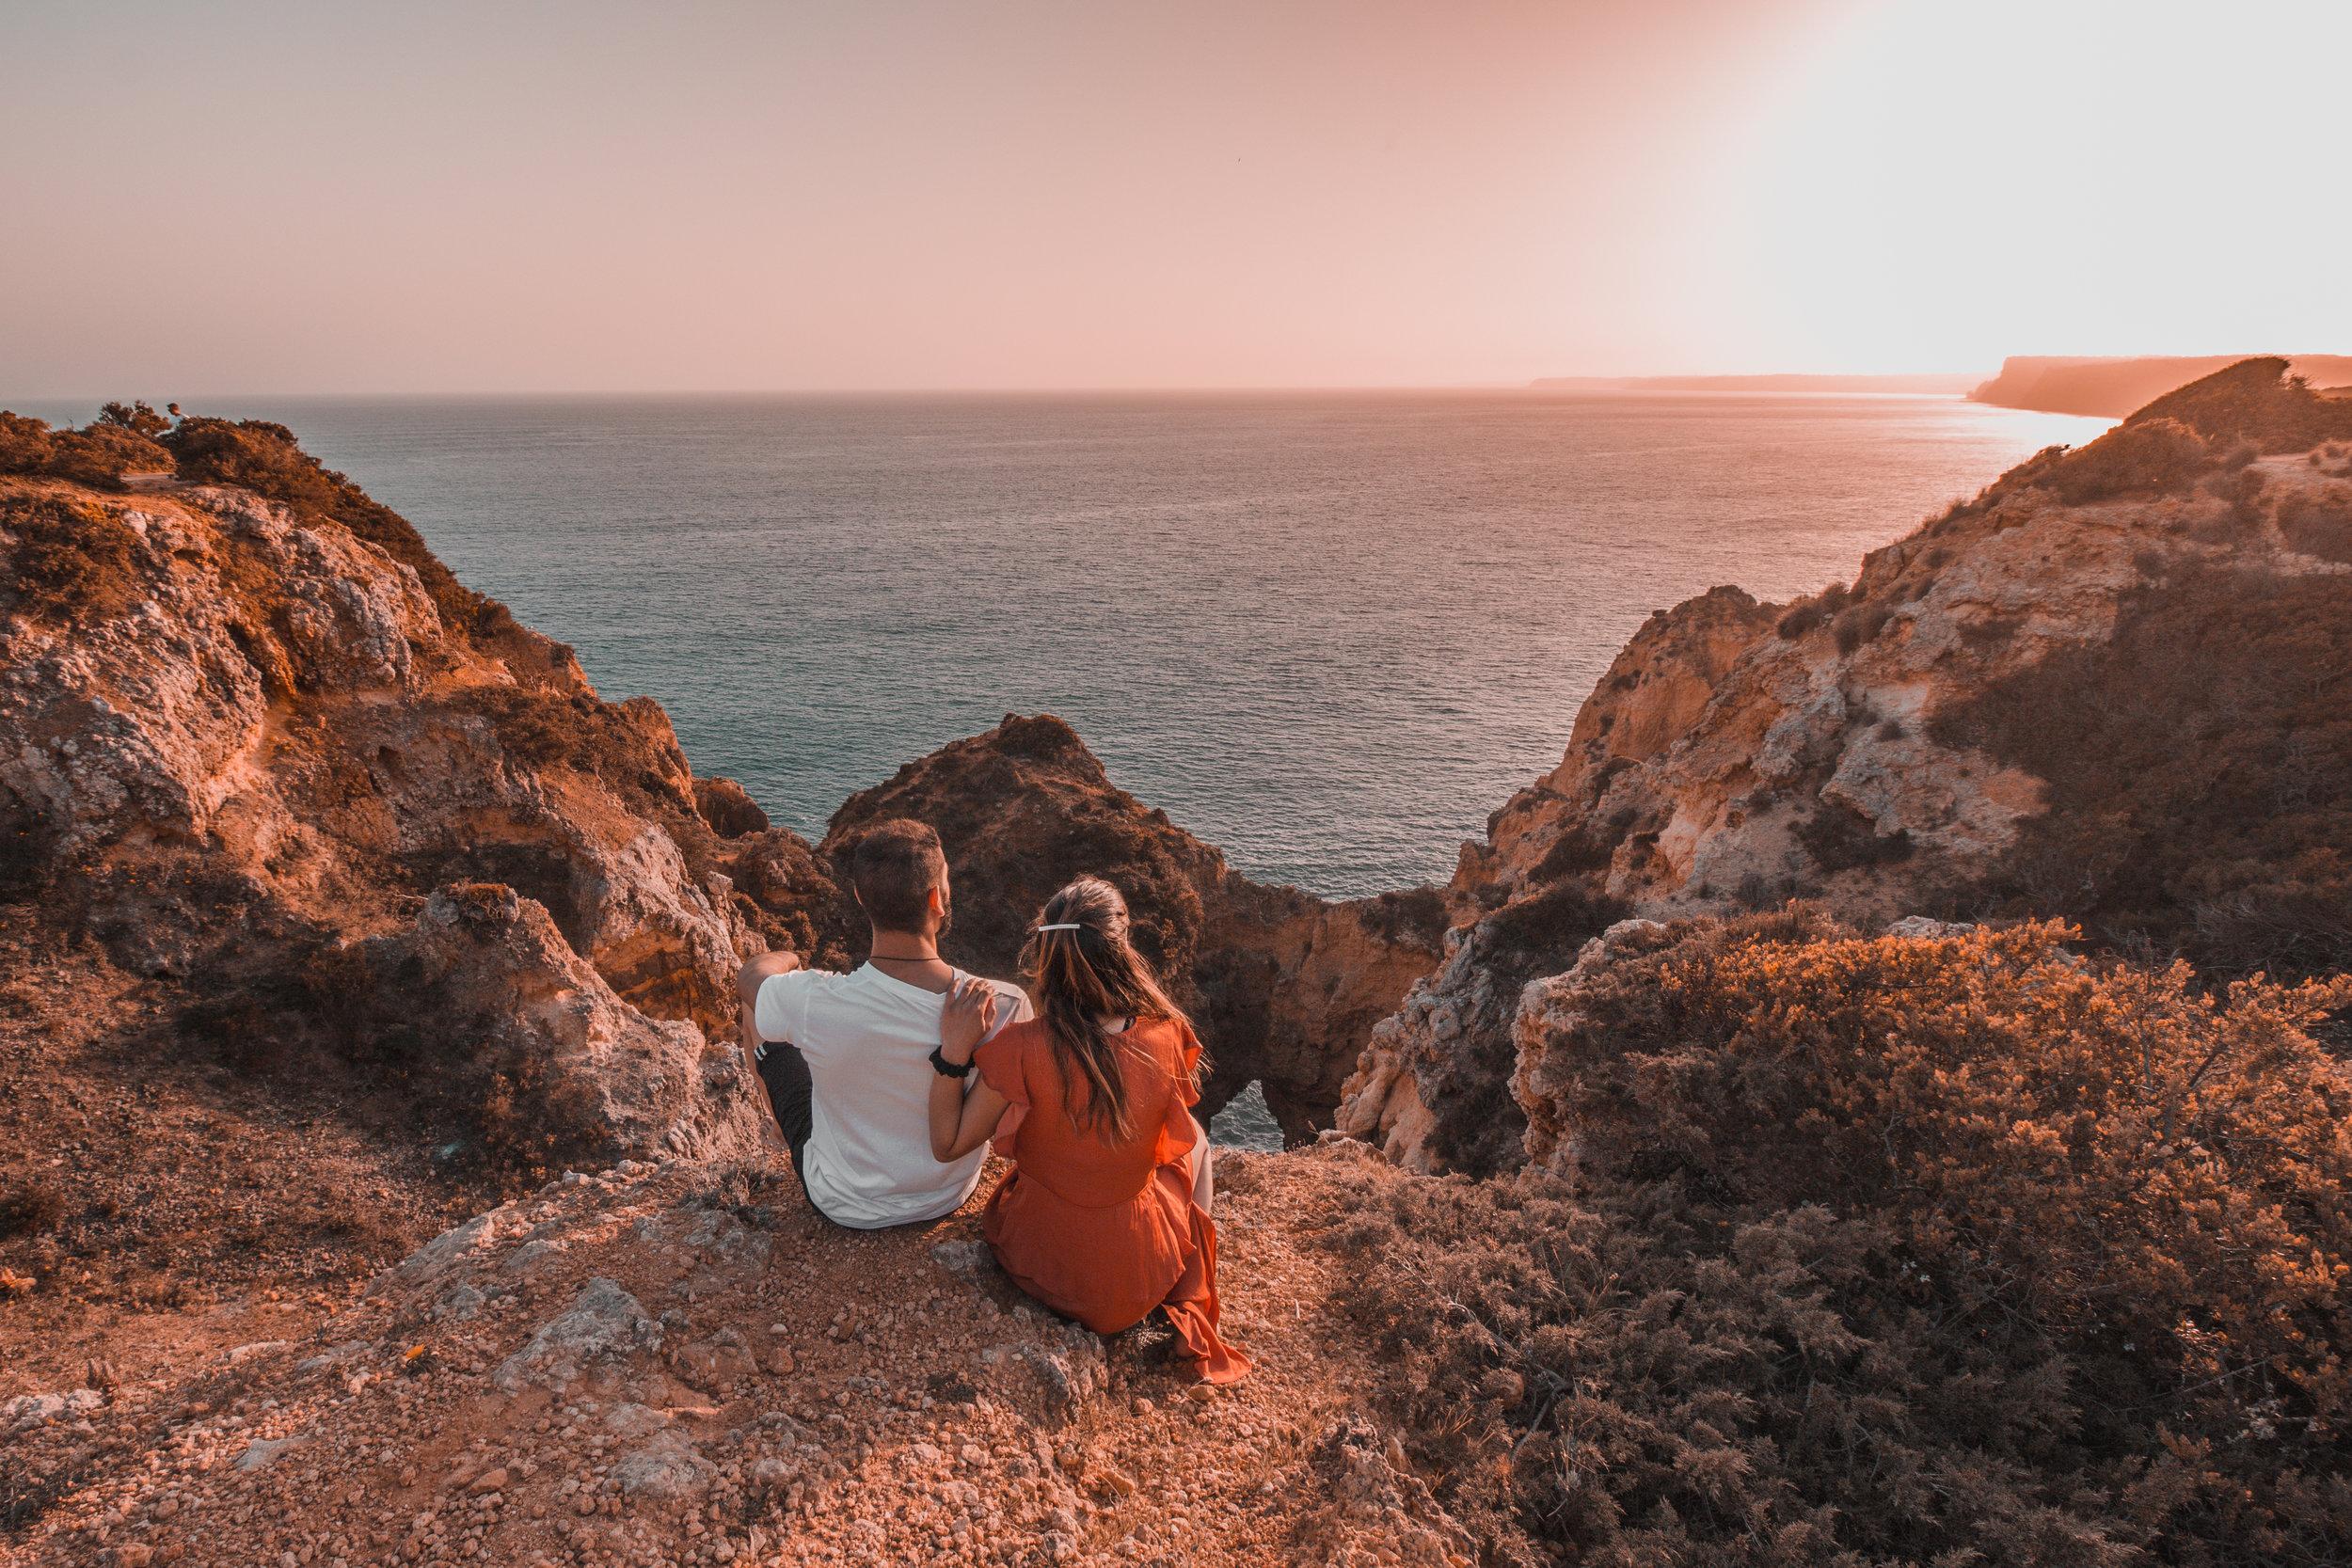 travel couple sunset ocean view photography best photos algarve portugal beach sea